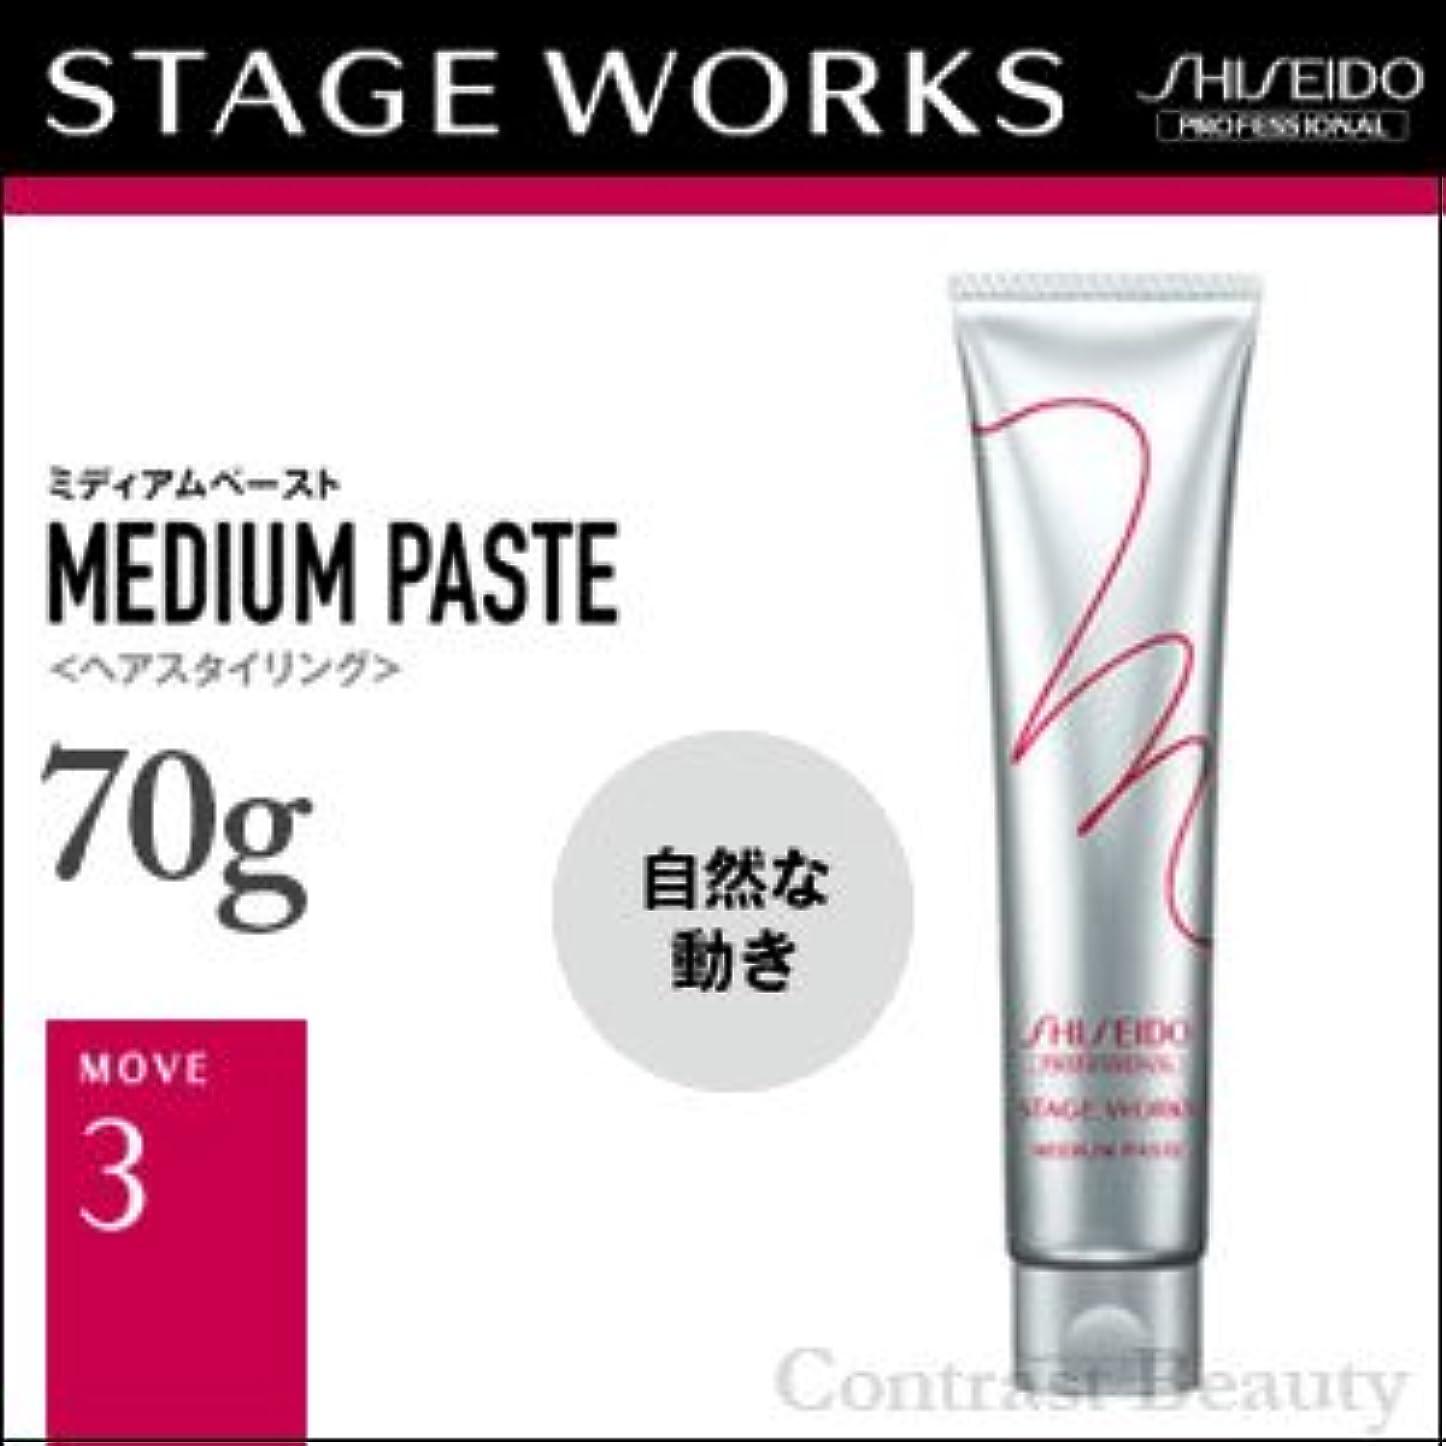 【x3個セット】 資生堂 ステージワークス ムーブ3 ミディアムペースト 70g